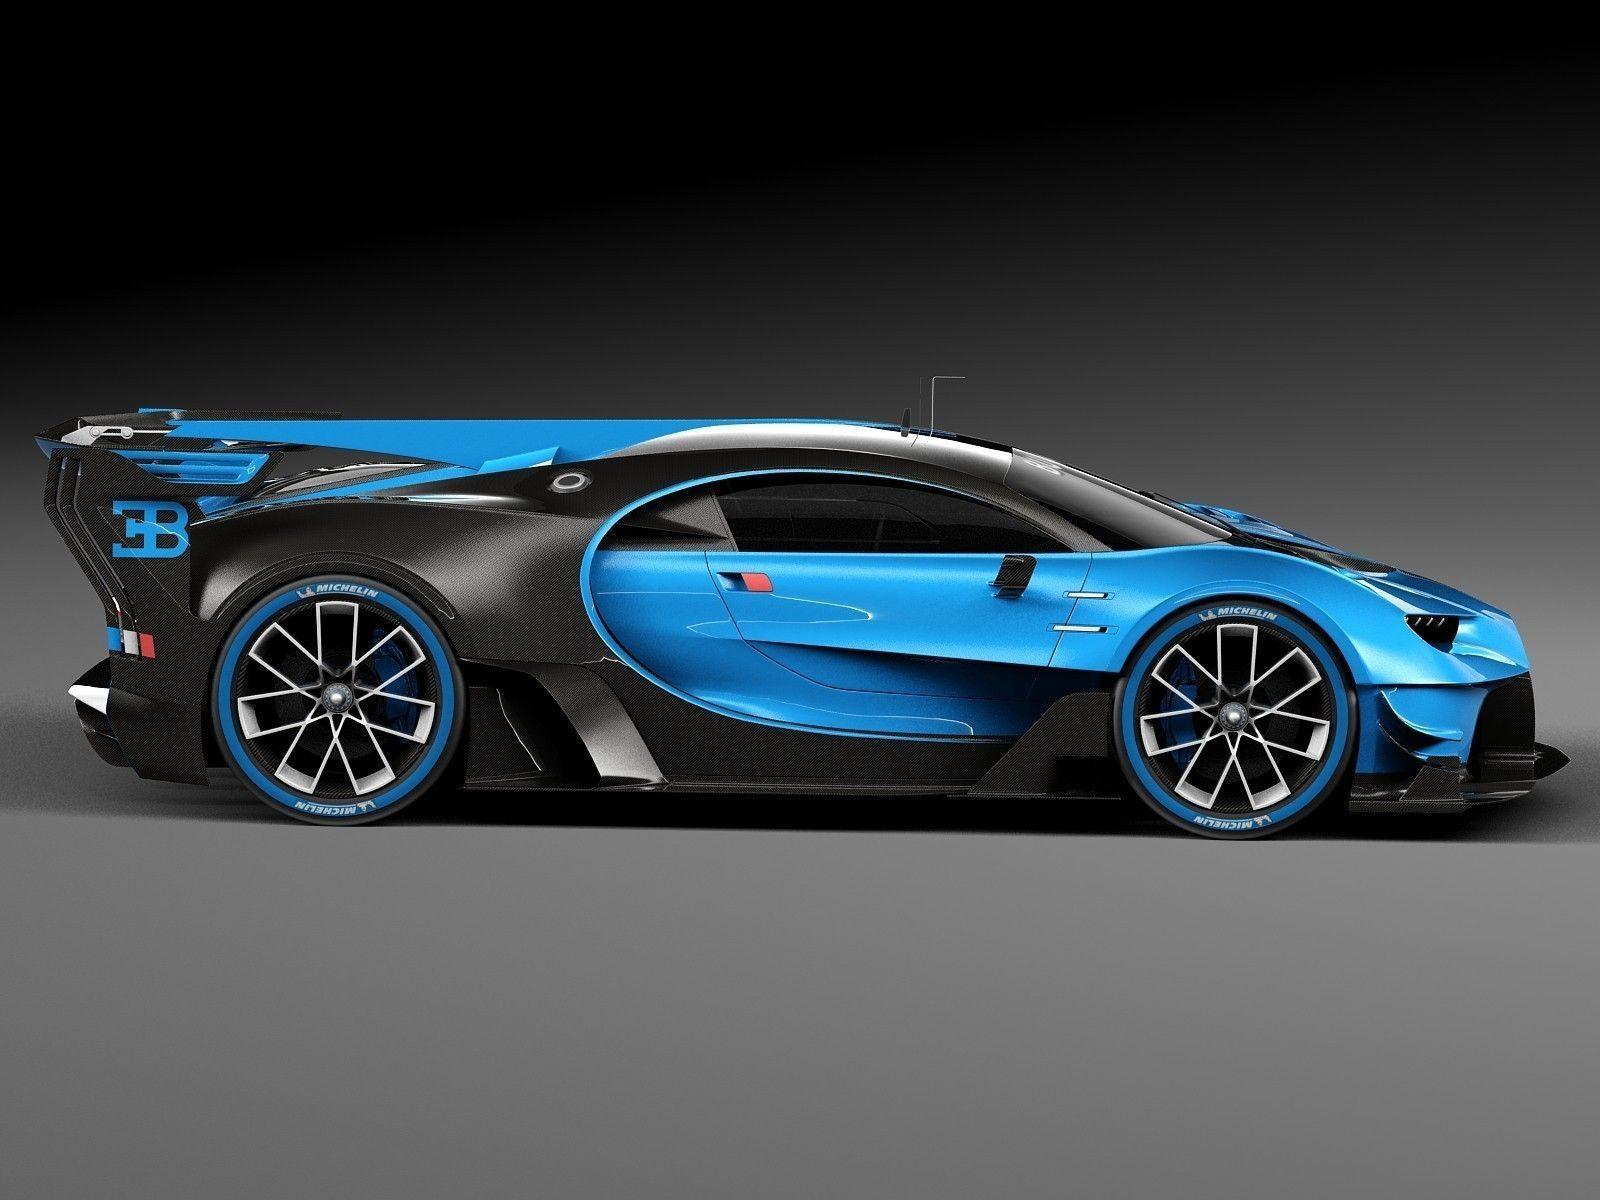 bugatti chiron race car 2017 3d model max obj 3ds fbx c4d lwo lw lws